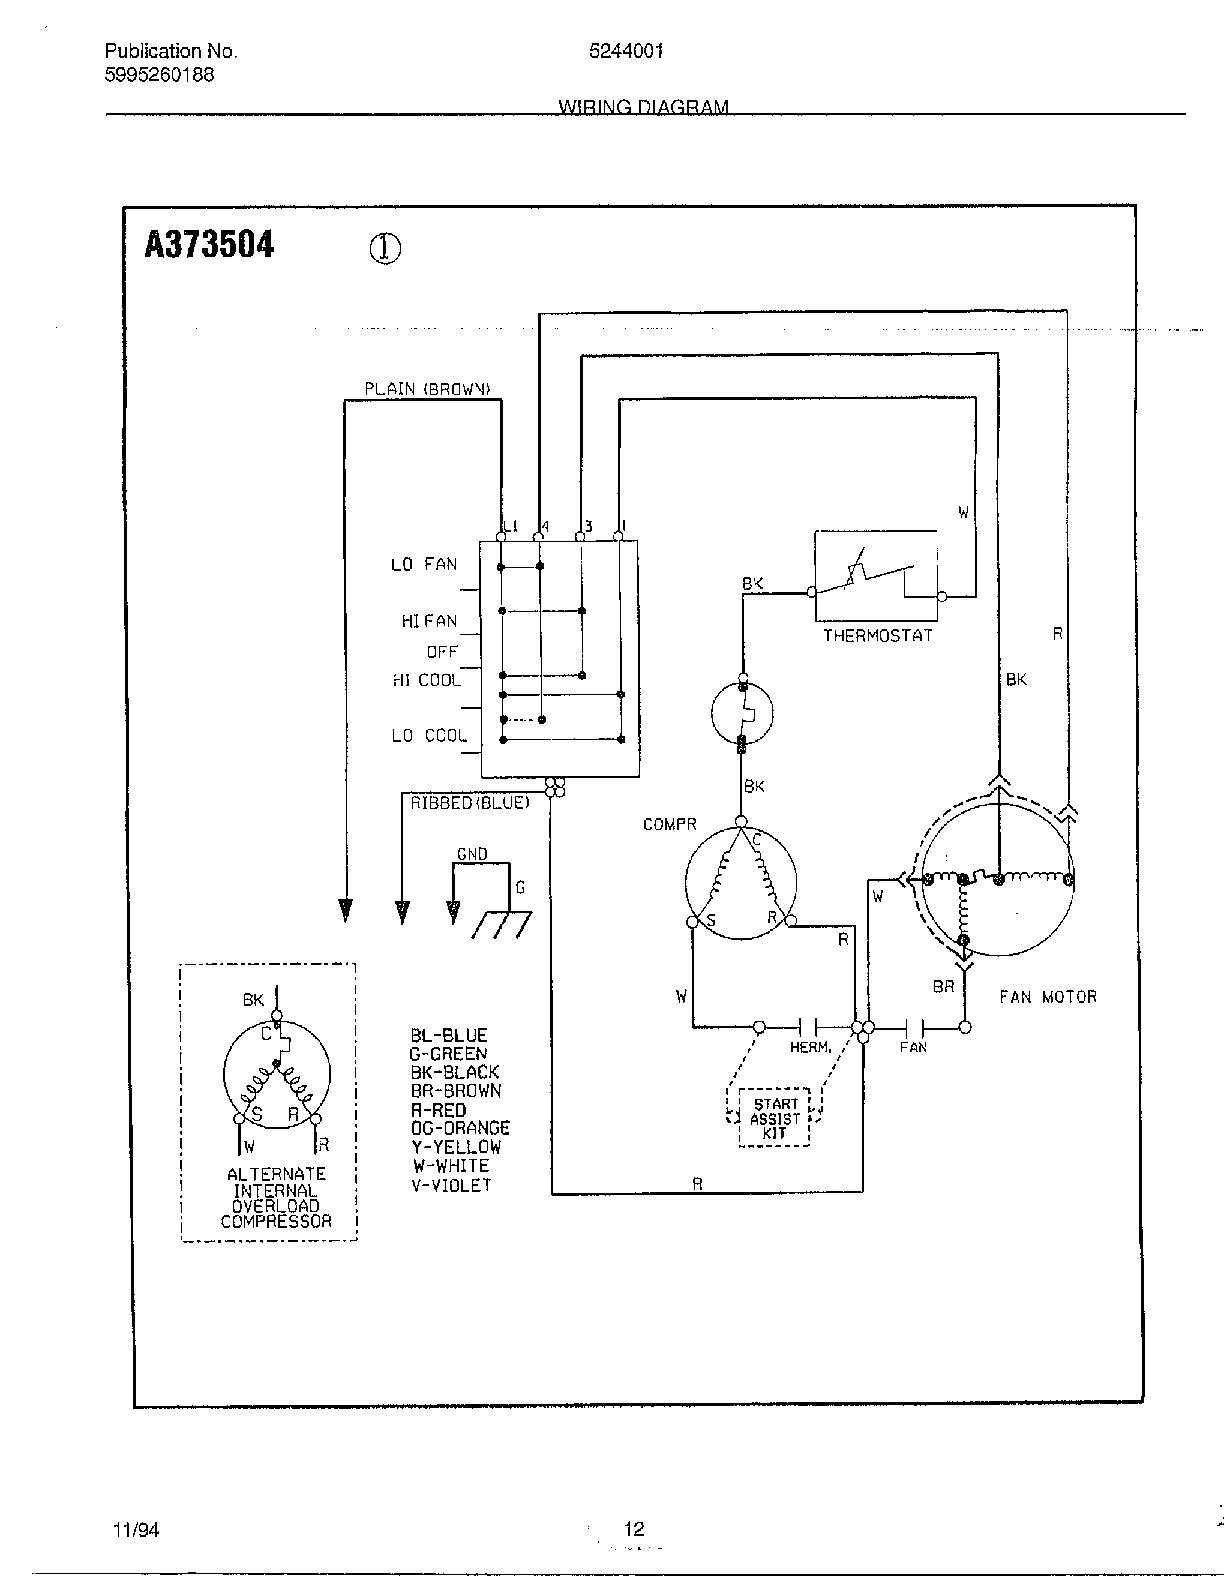 Wiring Diagram Window Type Air Conditioner B2network